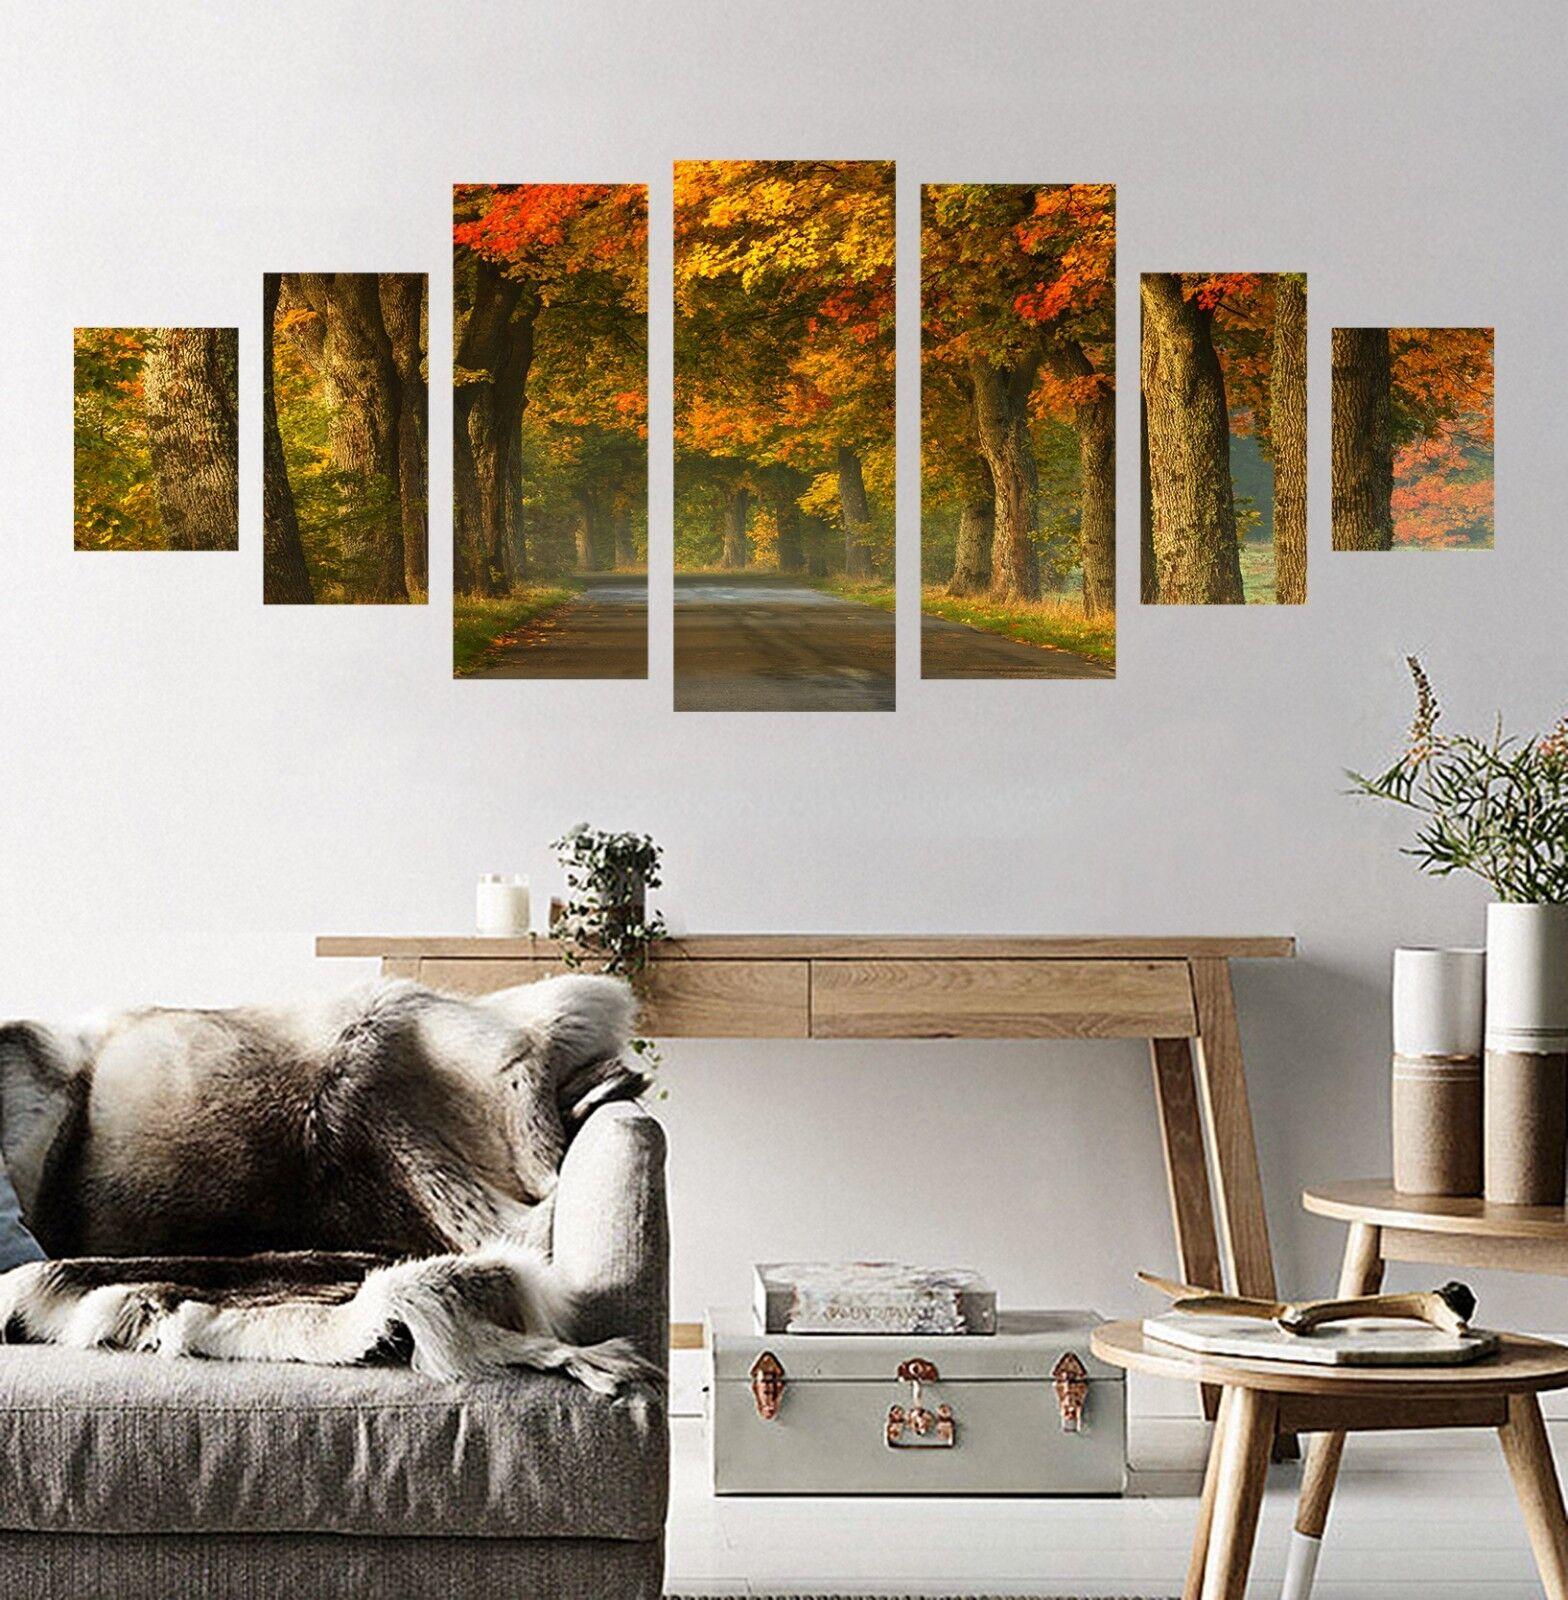 3D Fall Tree Road 73 Unframed Print Wall Paper Decal Wall Deco Indoor AJ Jenny